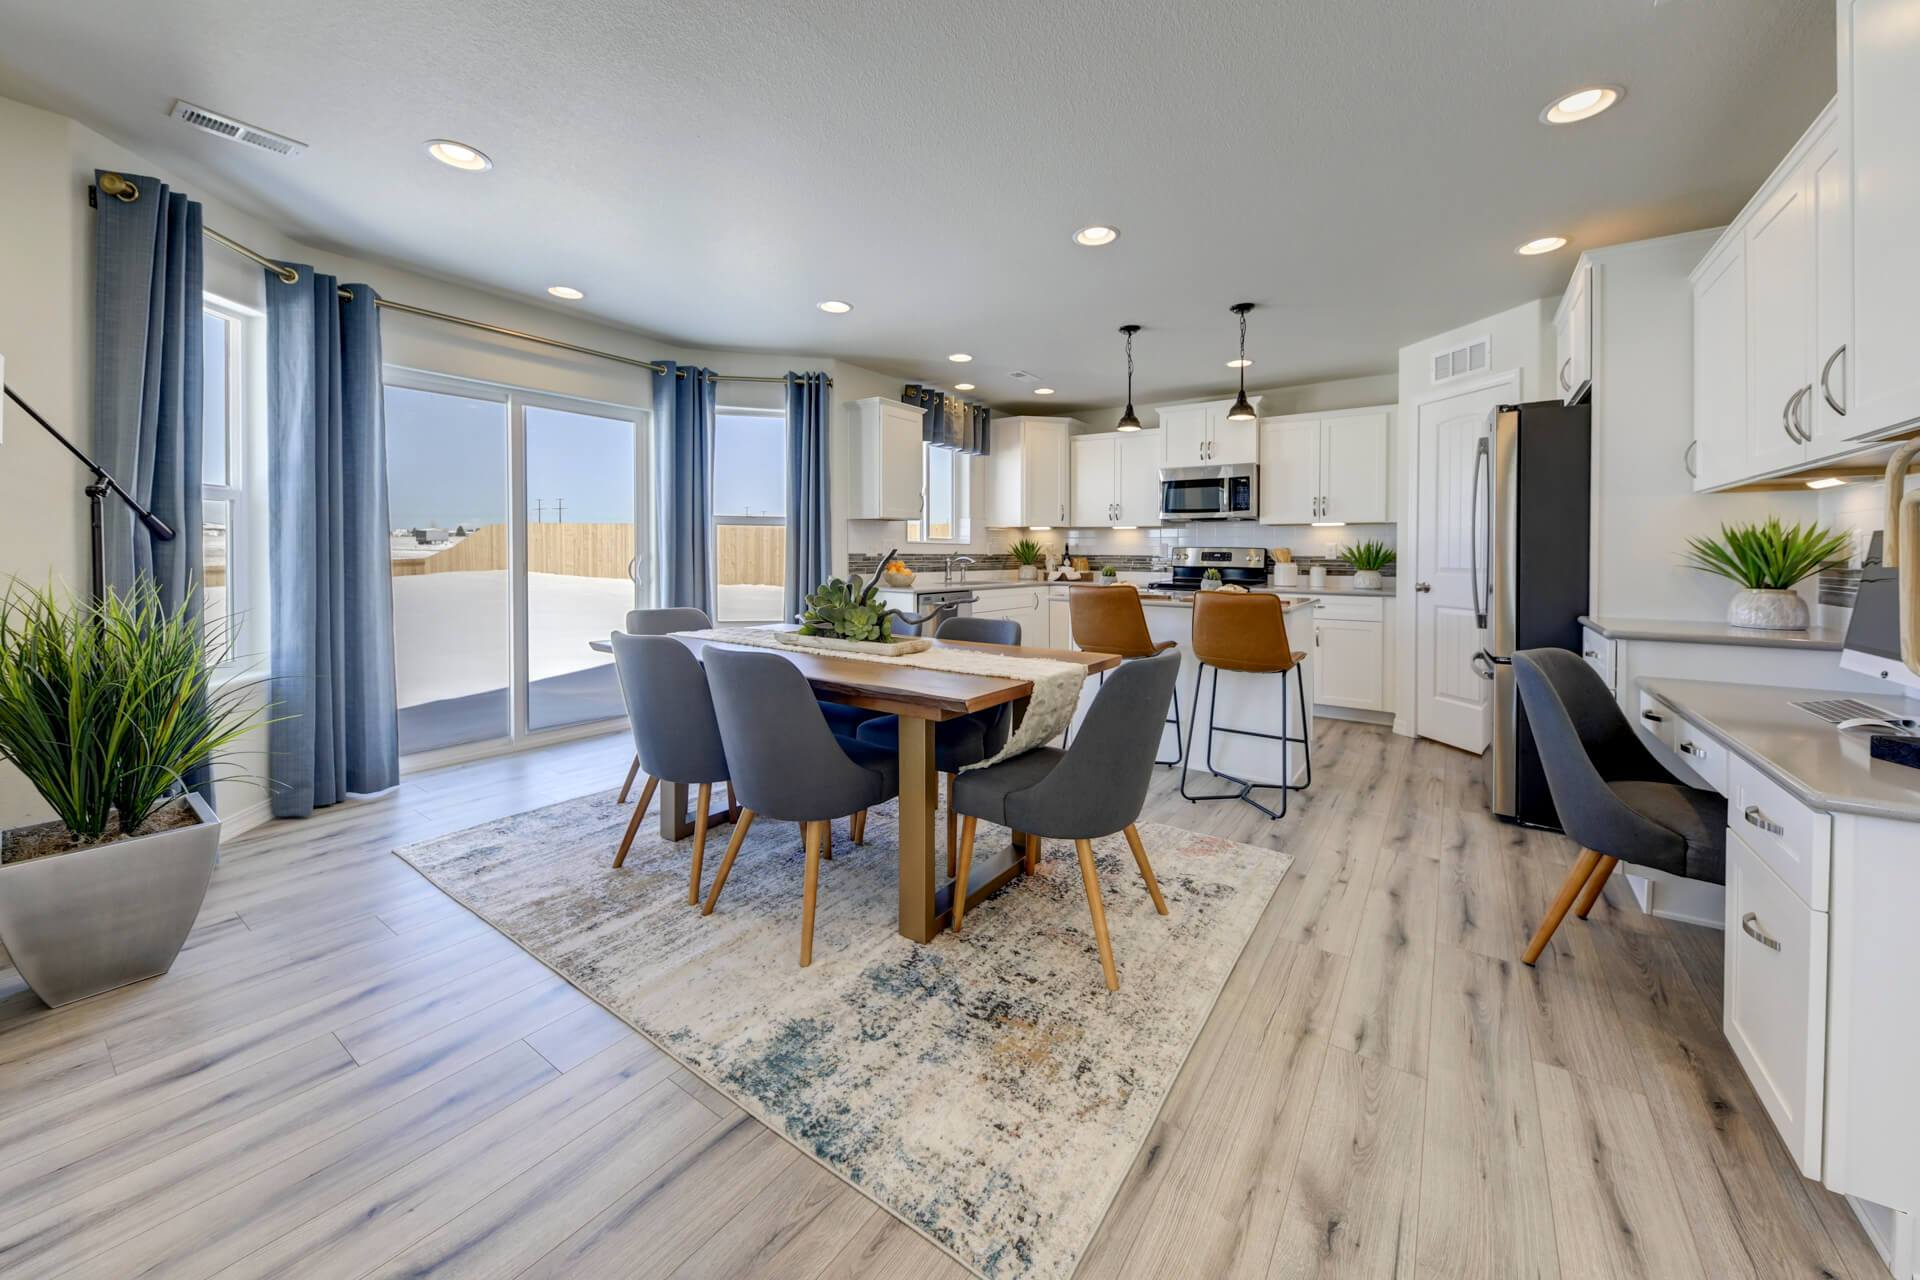 Kitchen featured in The Van Buren By Challenger Homes in Colorado Springs, CO